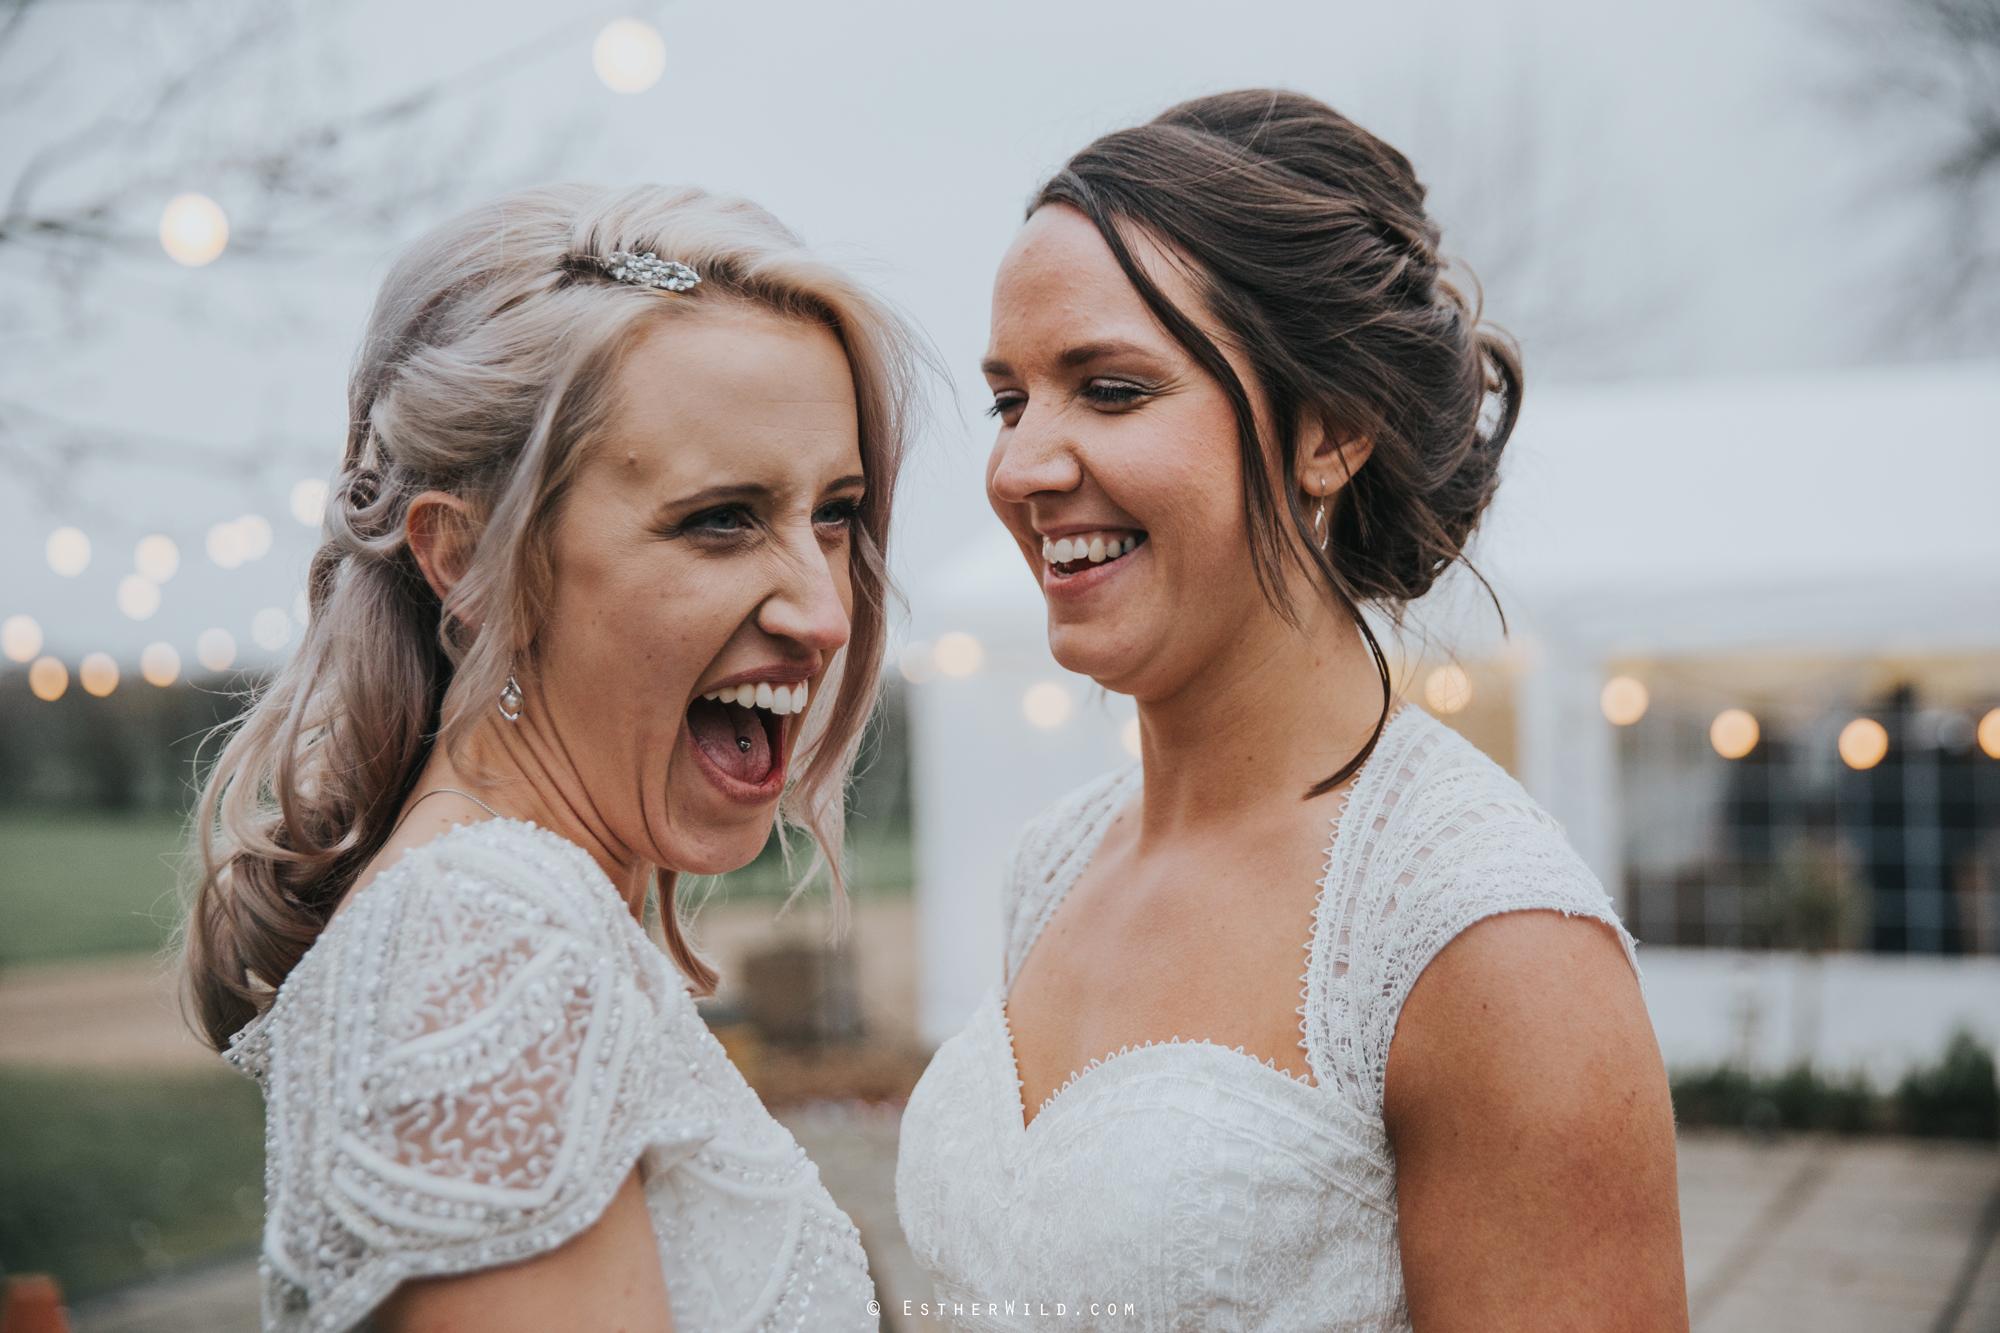 Elms_Barn_Weddings_Suffolk_Photographer_Copyright_Esther_Wild_IMG_2184.jpg